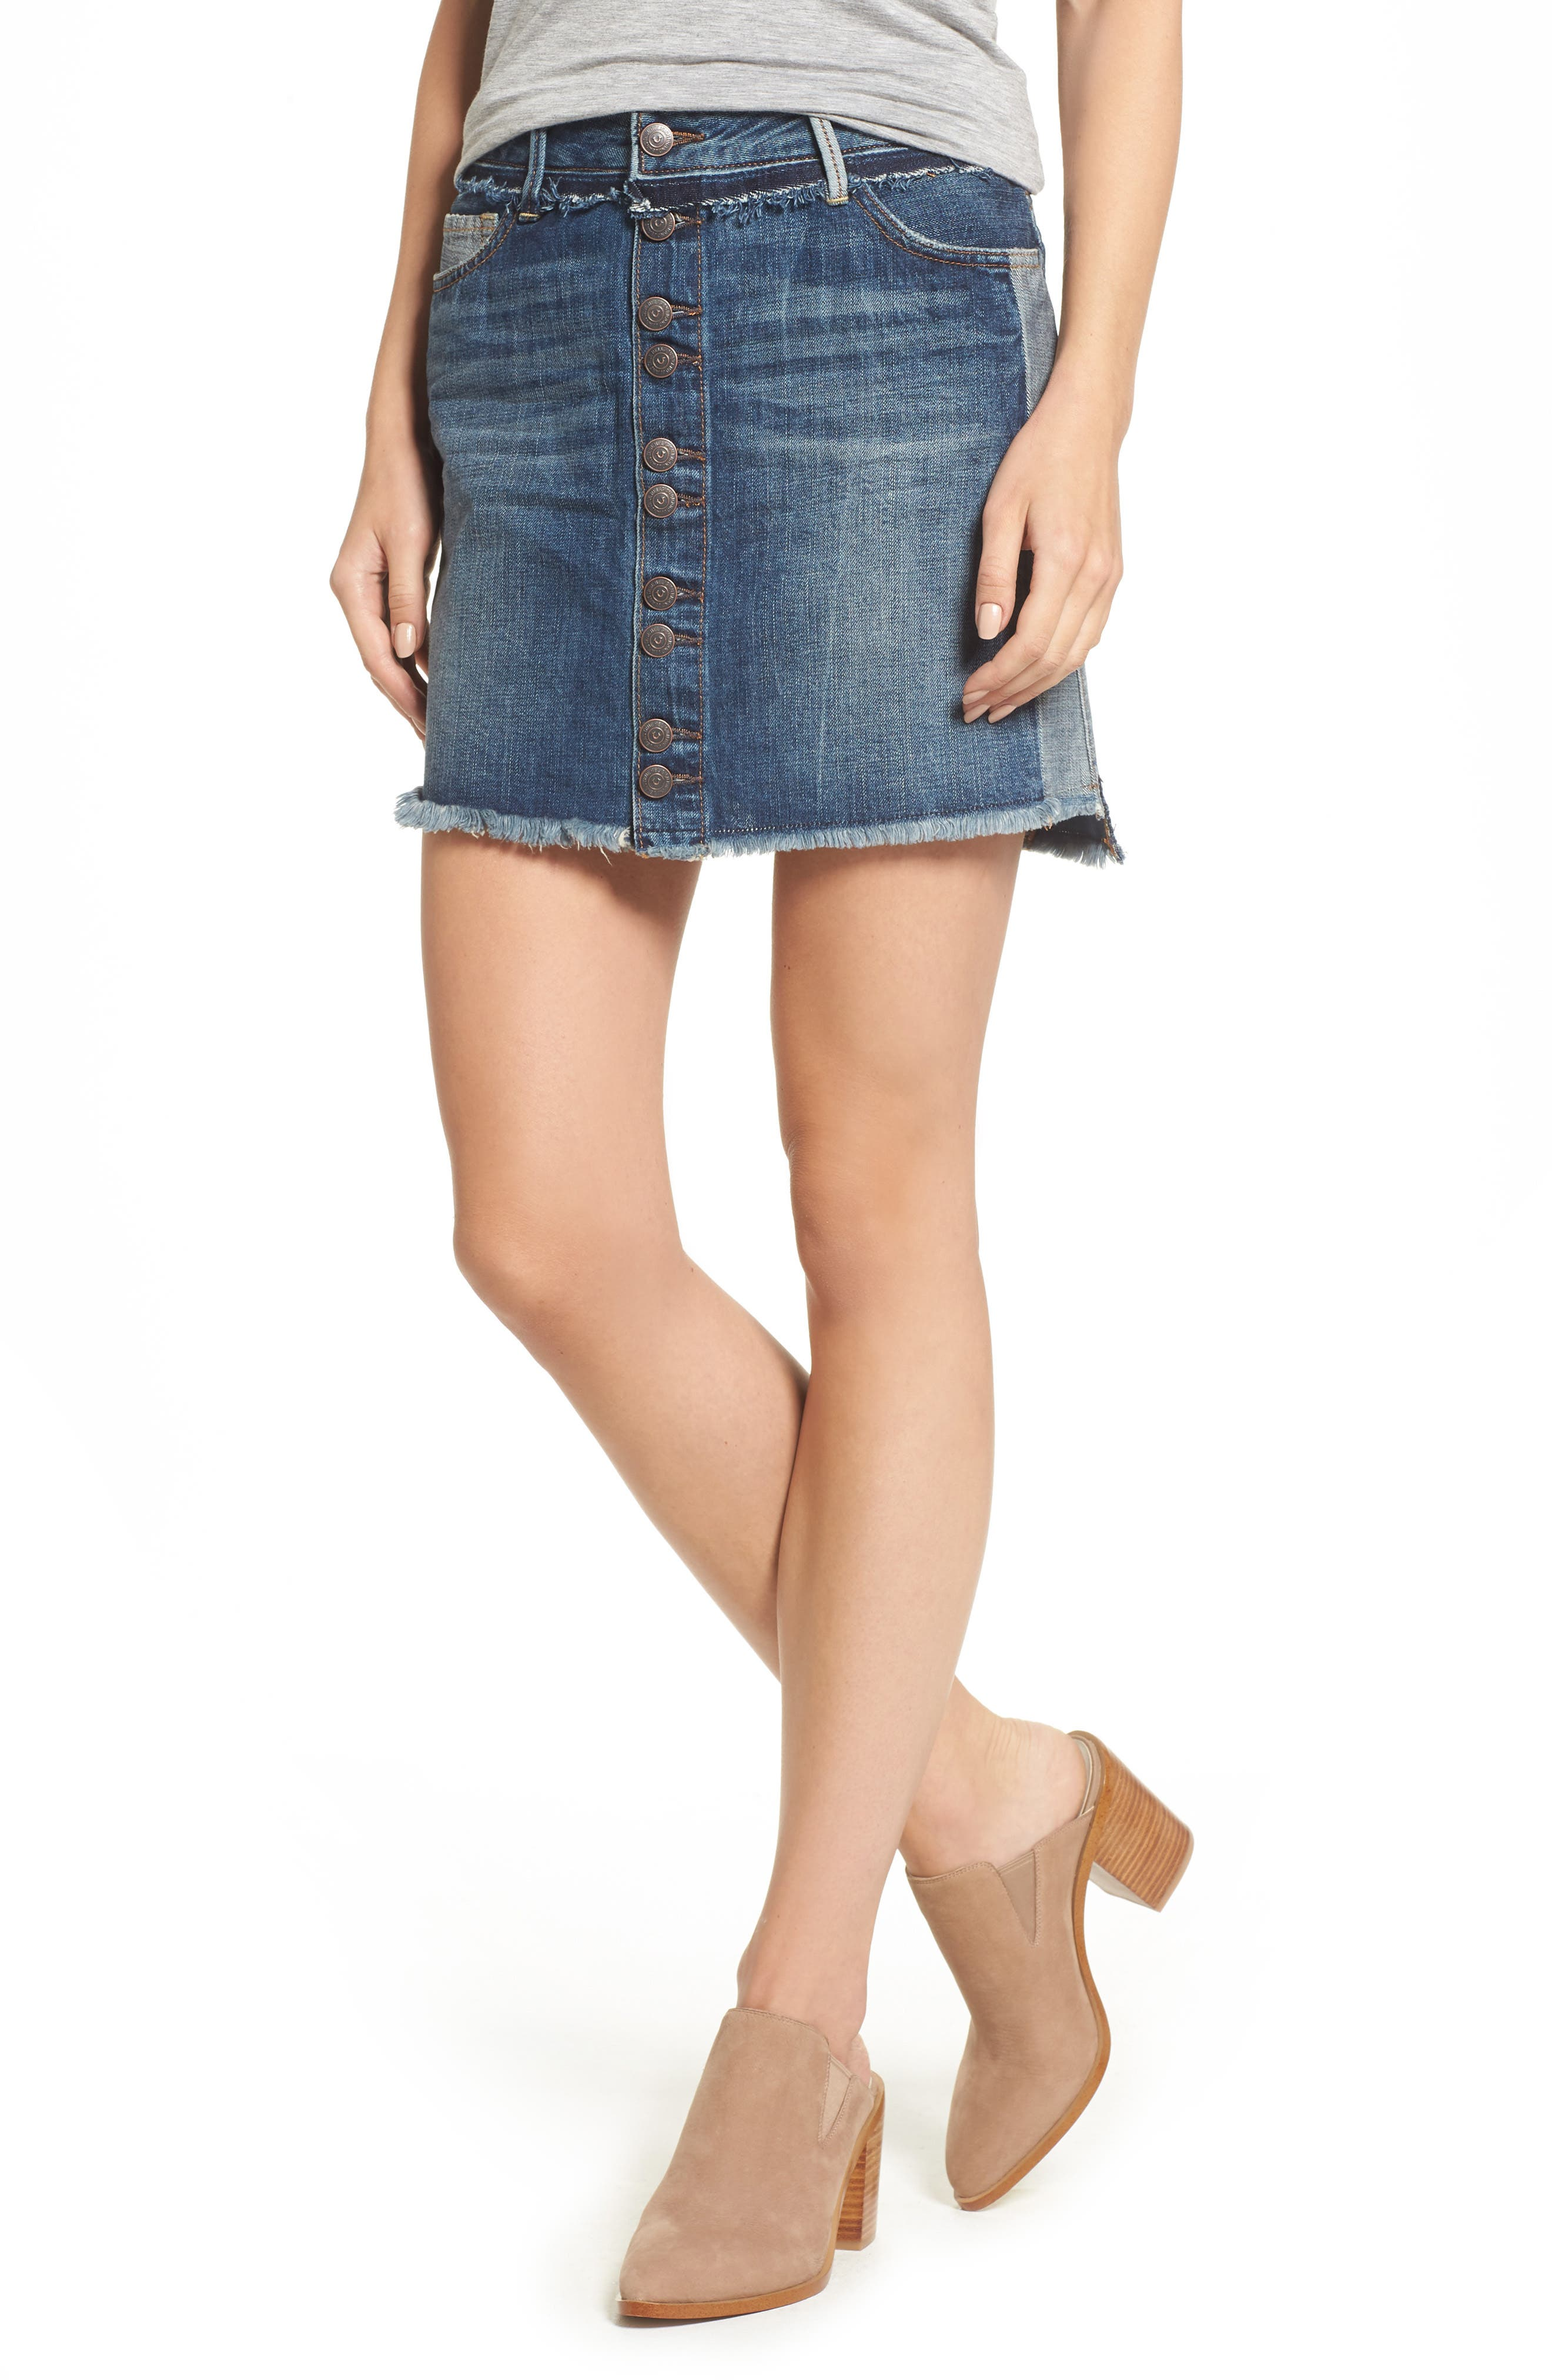 Main Image - True Religion Brand Jeans Deconstructed Denim Skirt